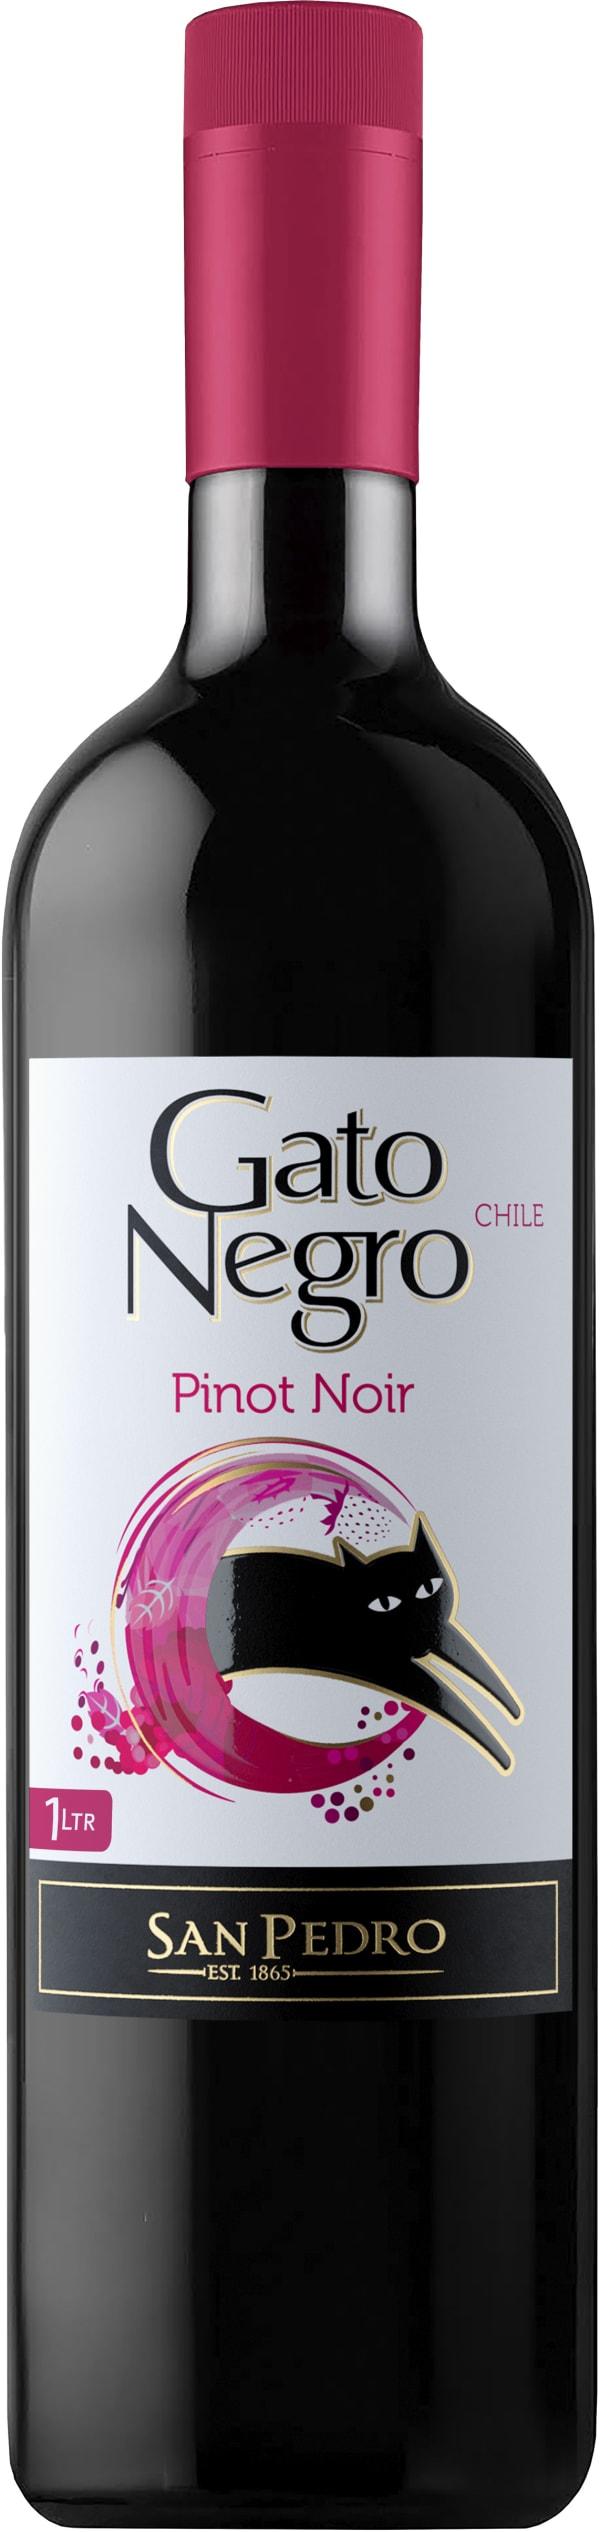 Gato Negro Pinot Noir 2019 plastflaska